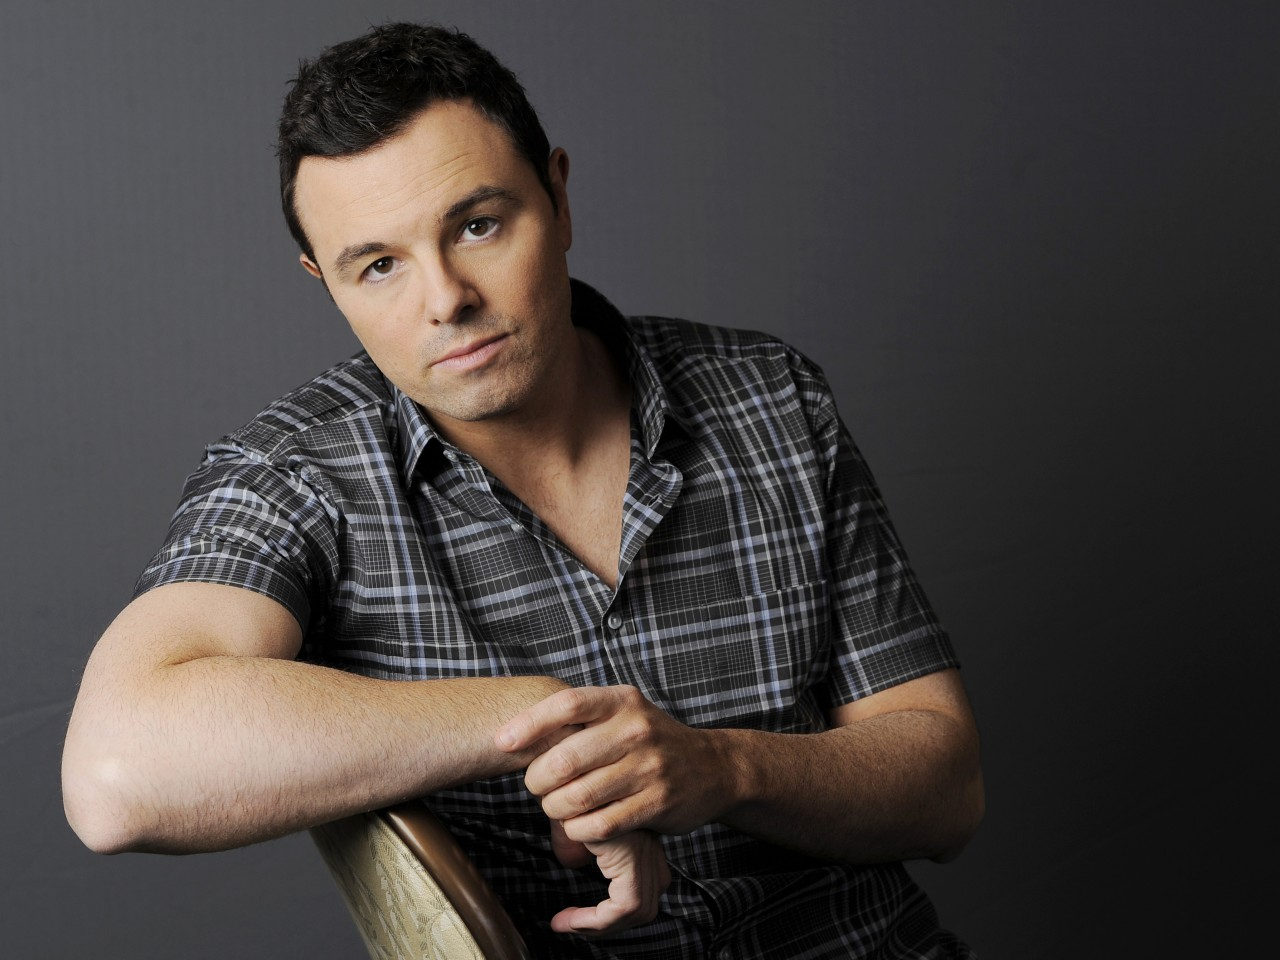 TV Producer Seth Macfarlane - age: 44